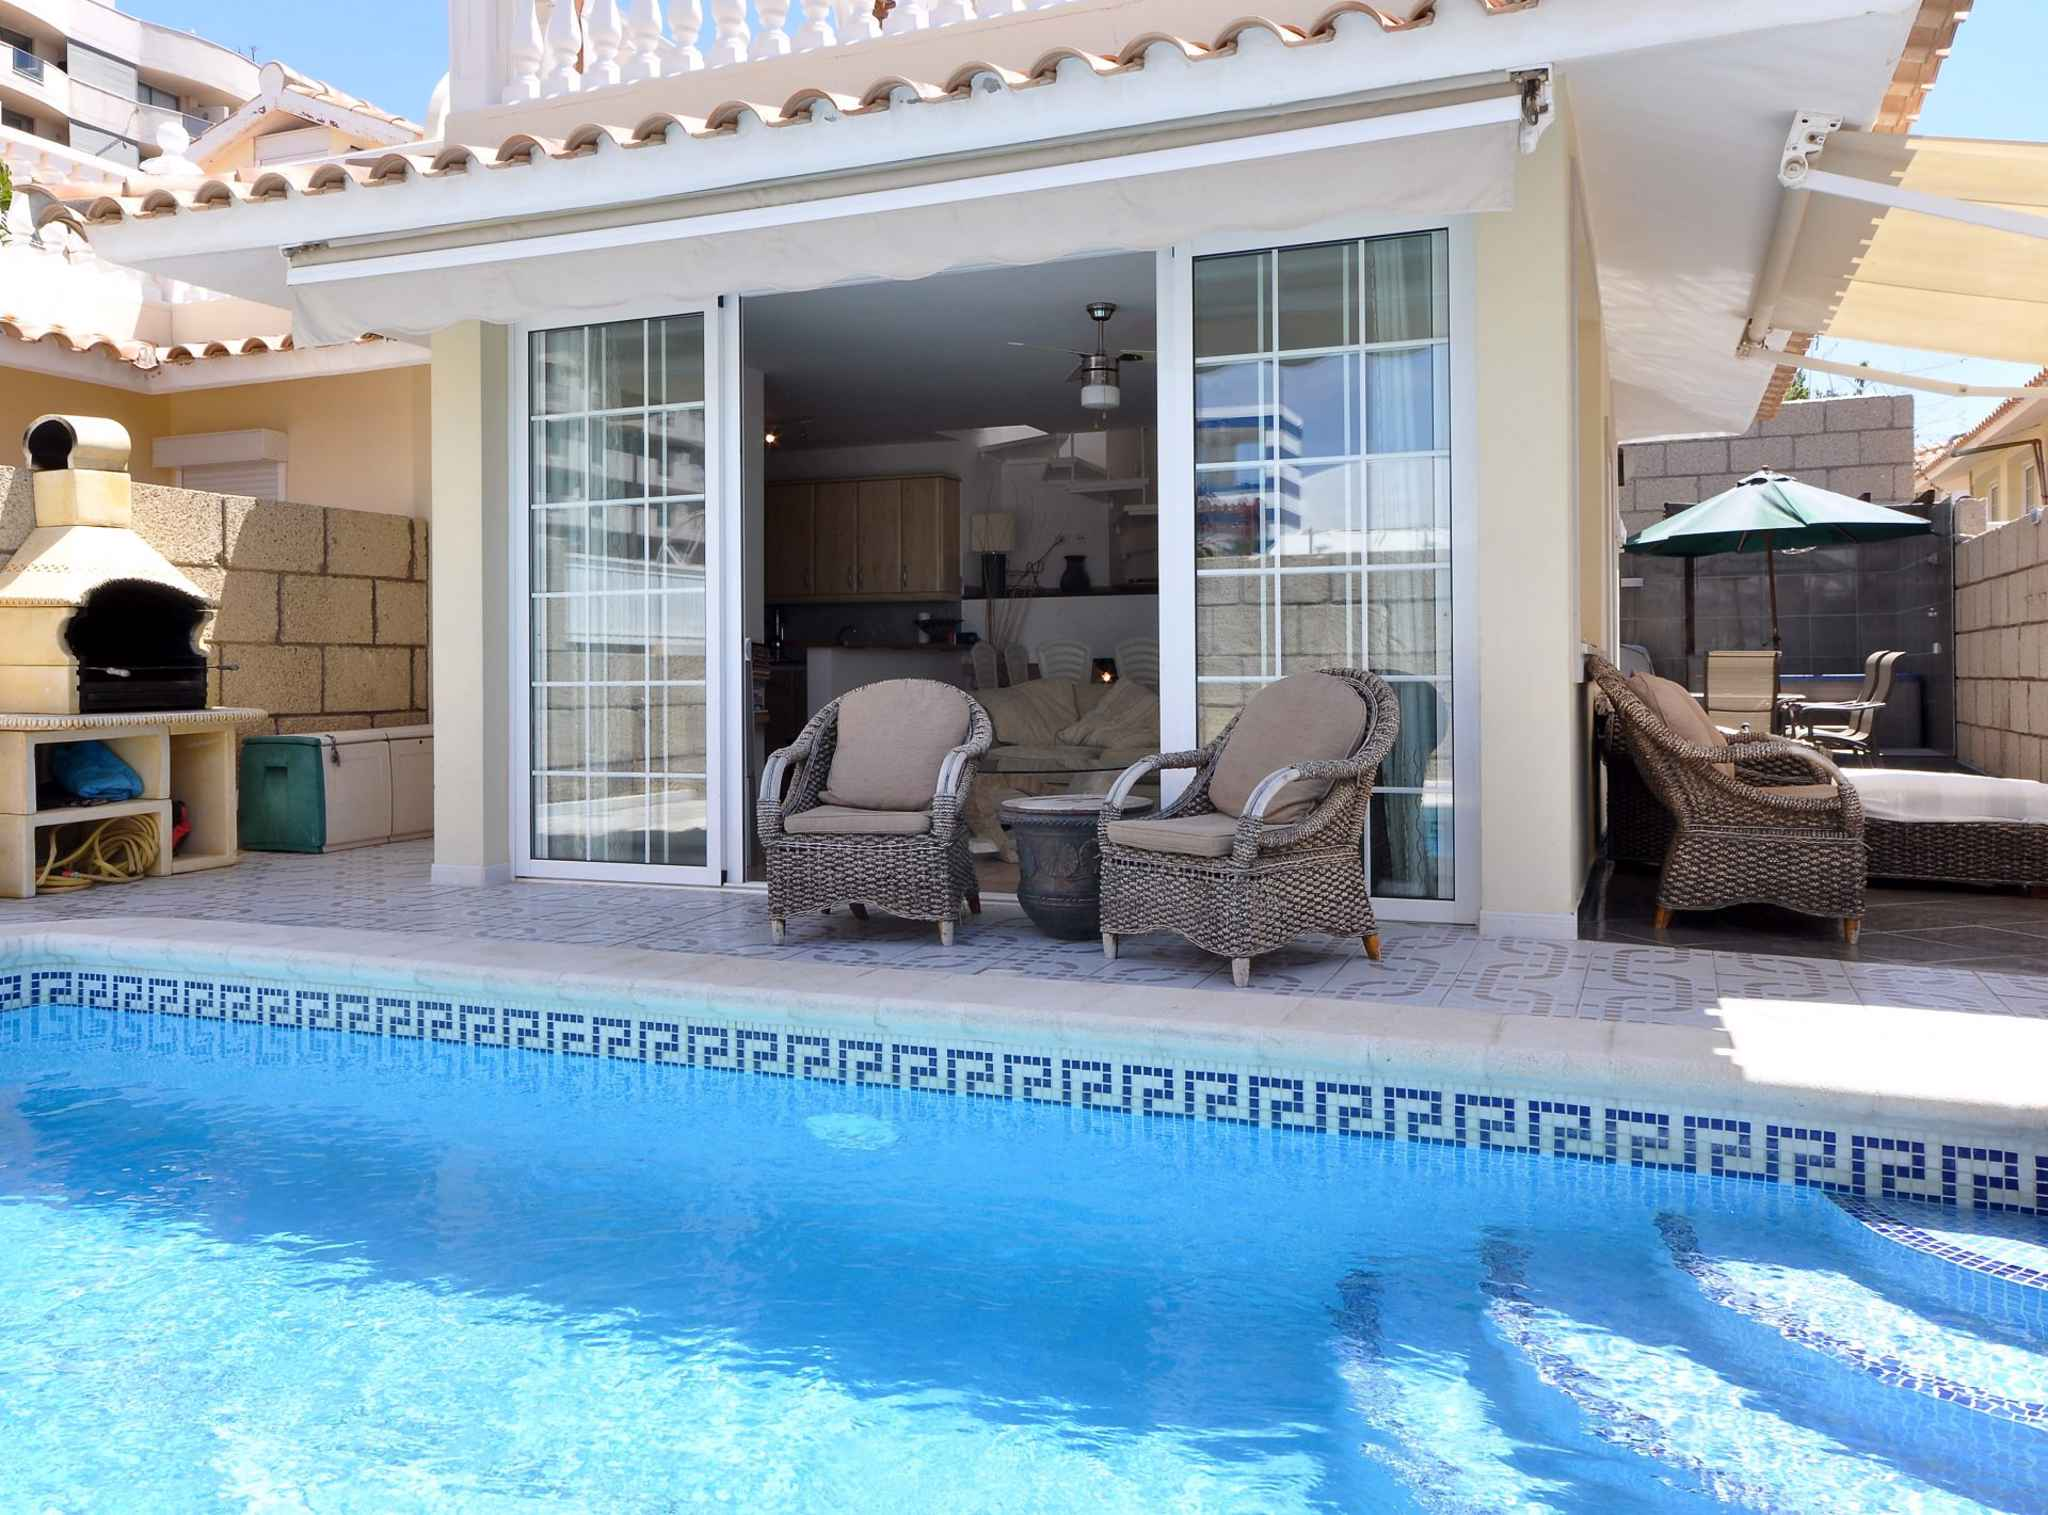 Holiday house mit eigenem Pool und Yacuzzi (1671164), Palm-Mar, Tenerife, Canary Islands, Spain, picture 4